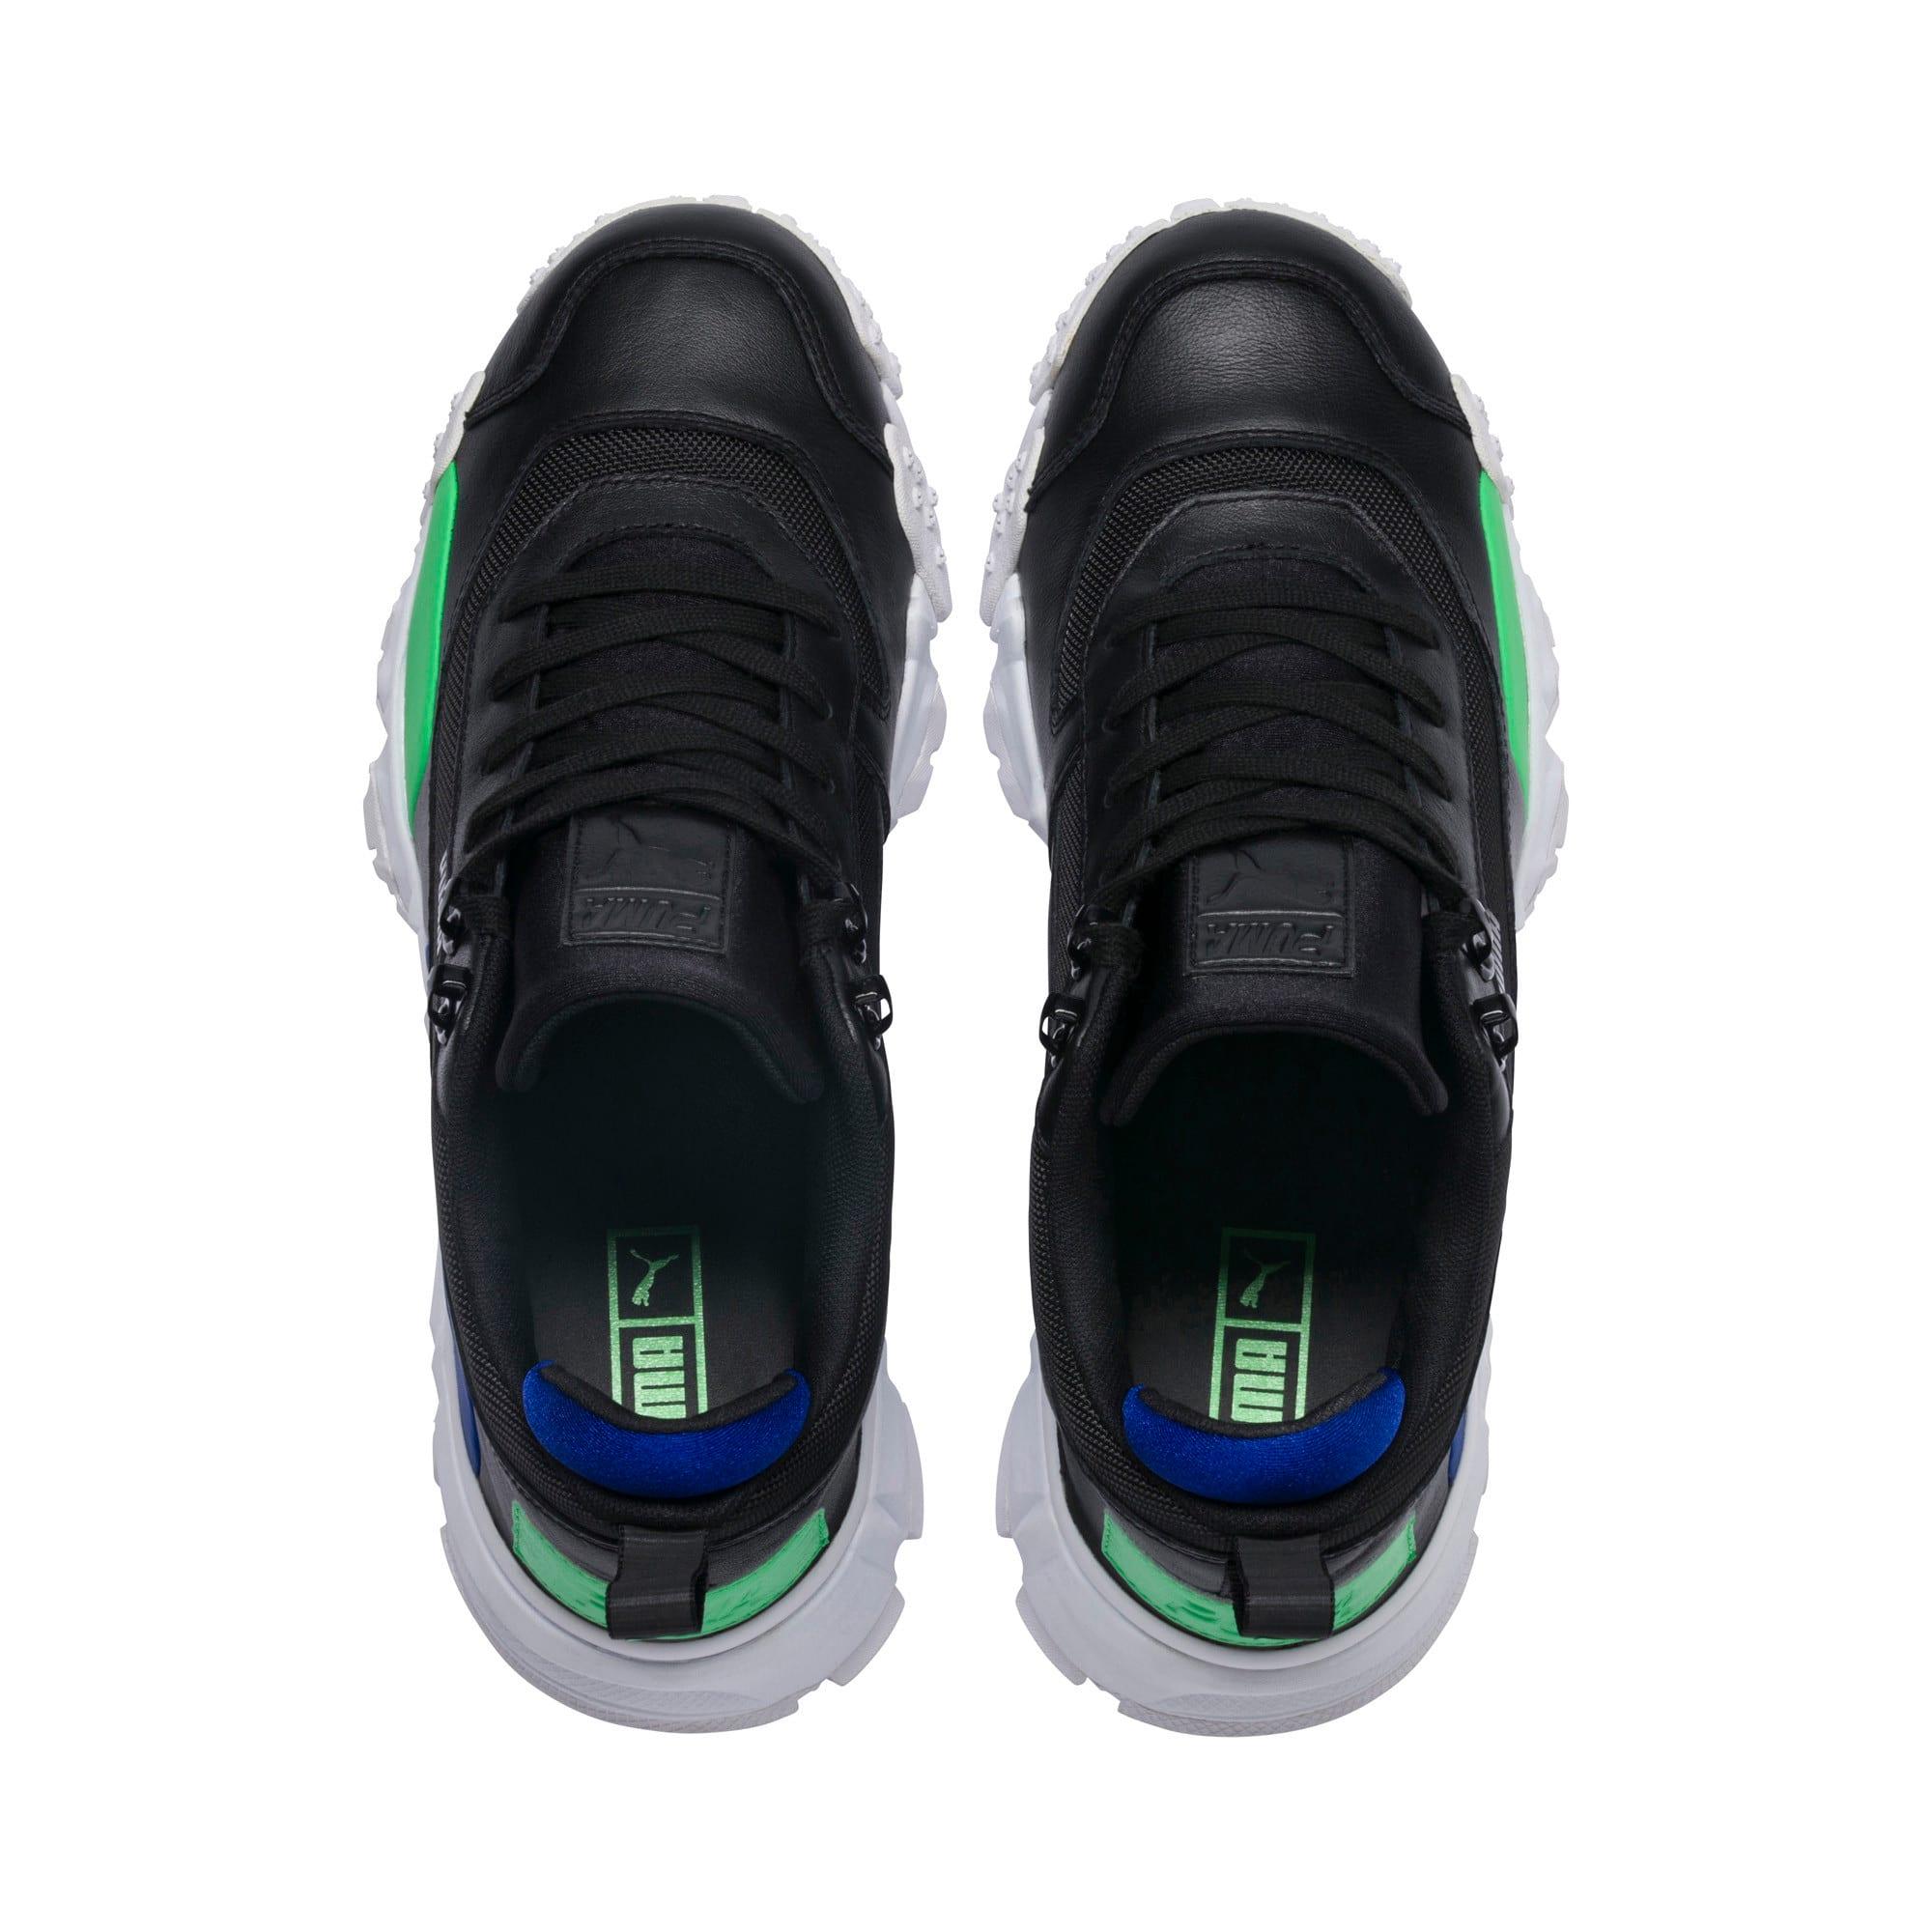 Thumbnail 7 of Trailfox Leather Sneakers, Puma Black-Irish Green, medium